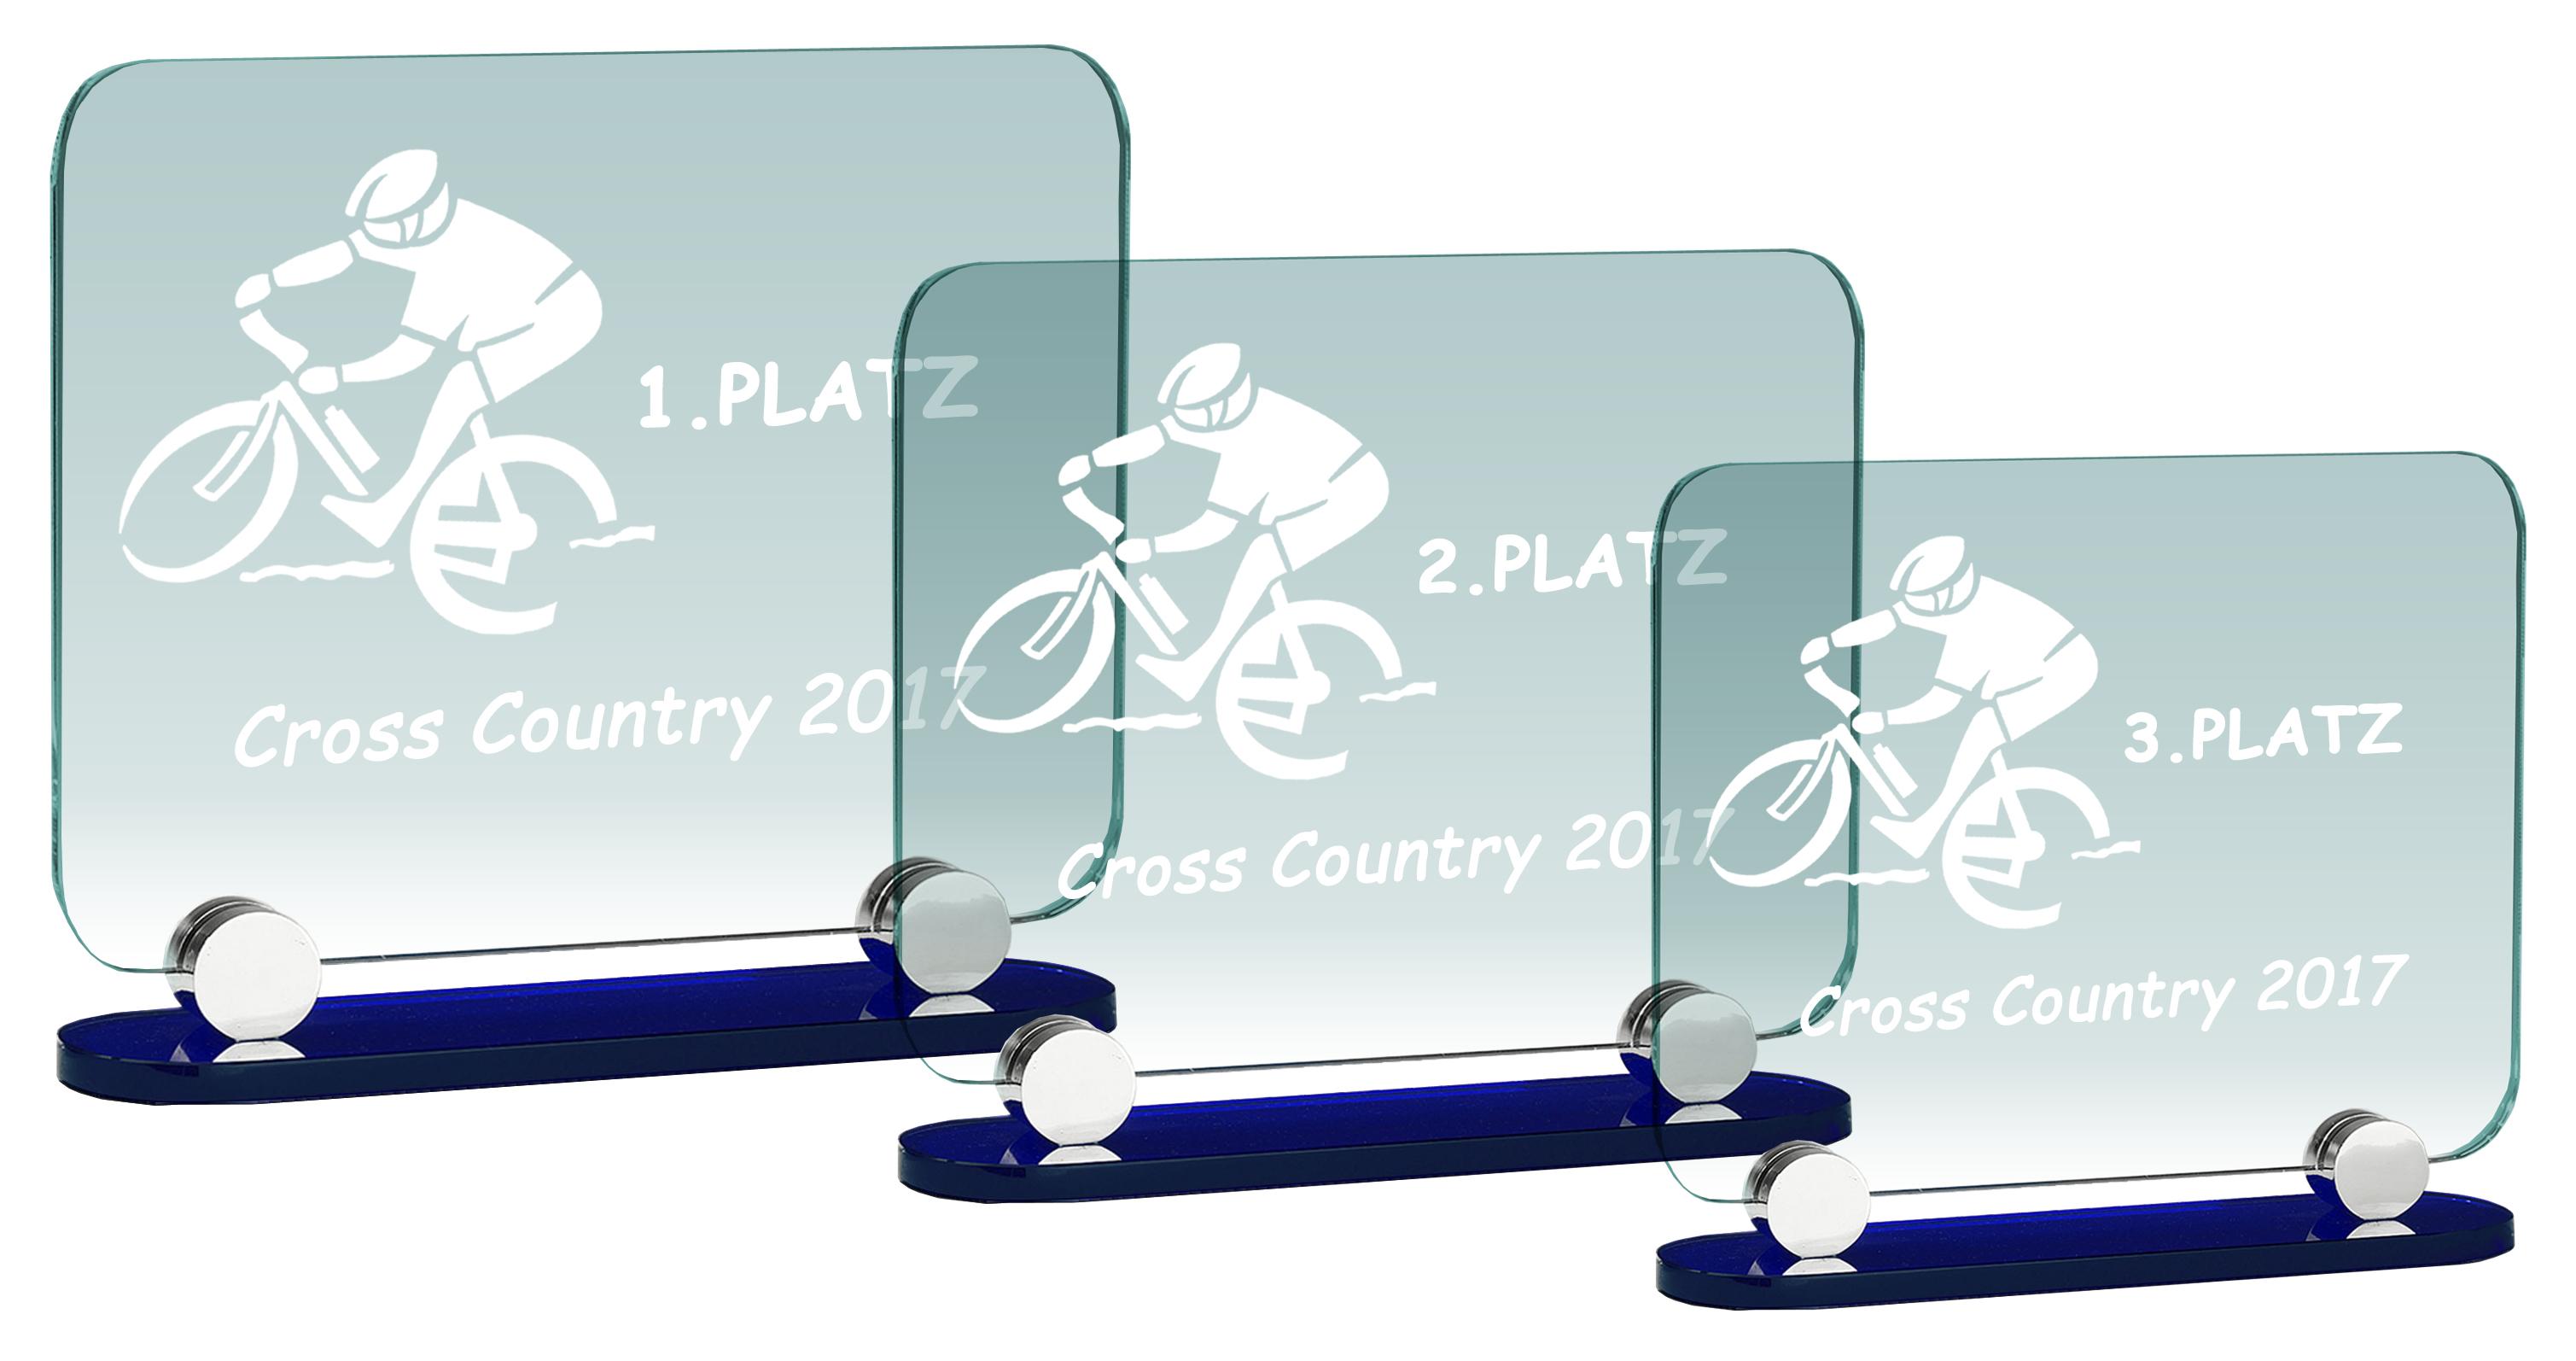 Glaspokale Glastrophäen alle Sportarten 19,5-23,5 cm Glastrophäen